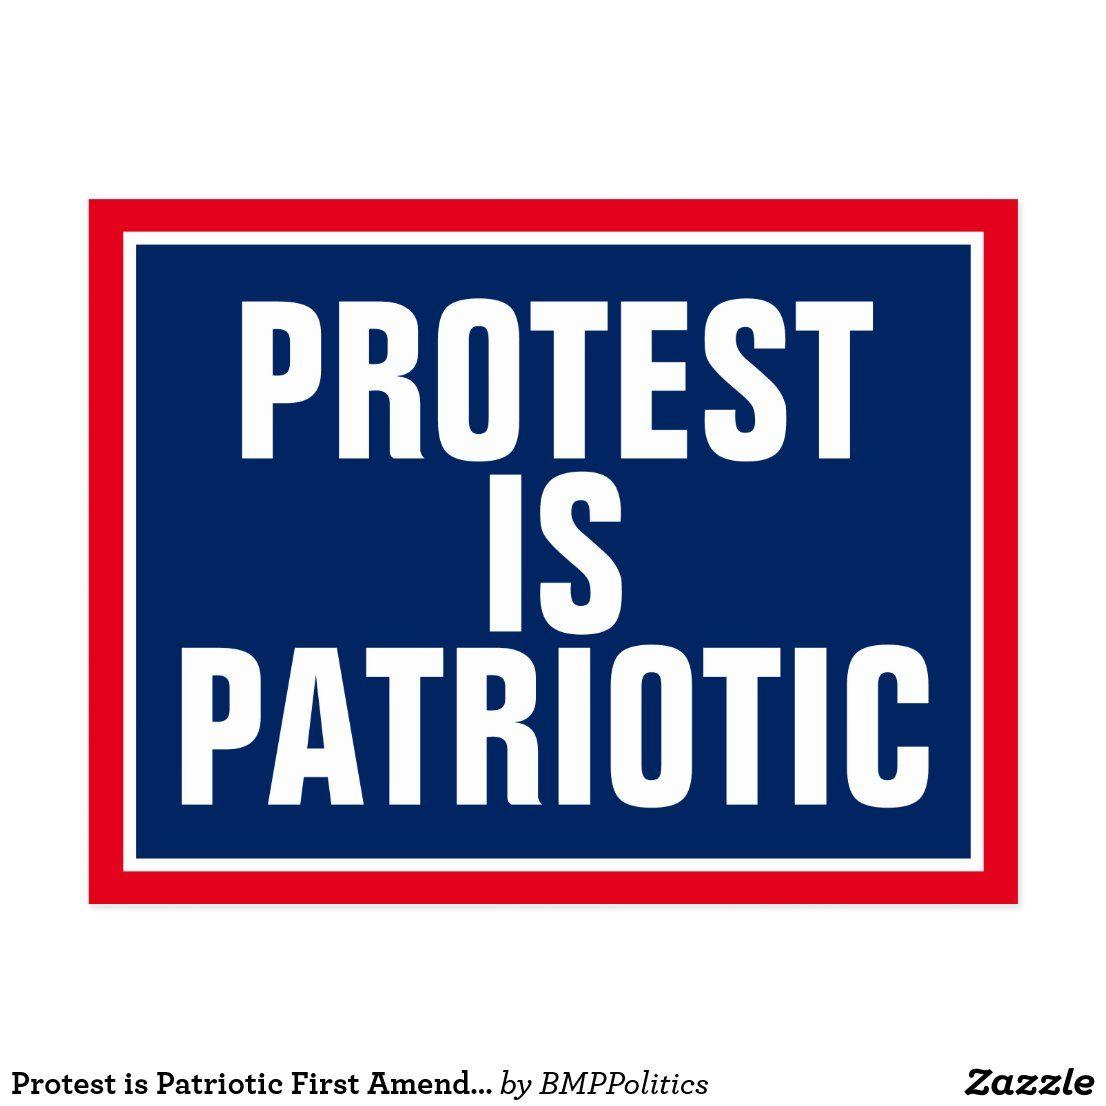 Protest Is Patriotic First Amendment Postcard Zazzle Com In 2020 Patriotic Postcard Protest